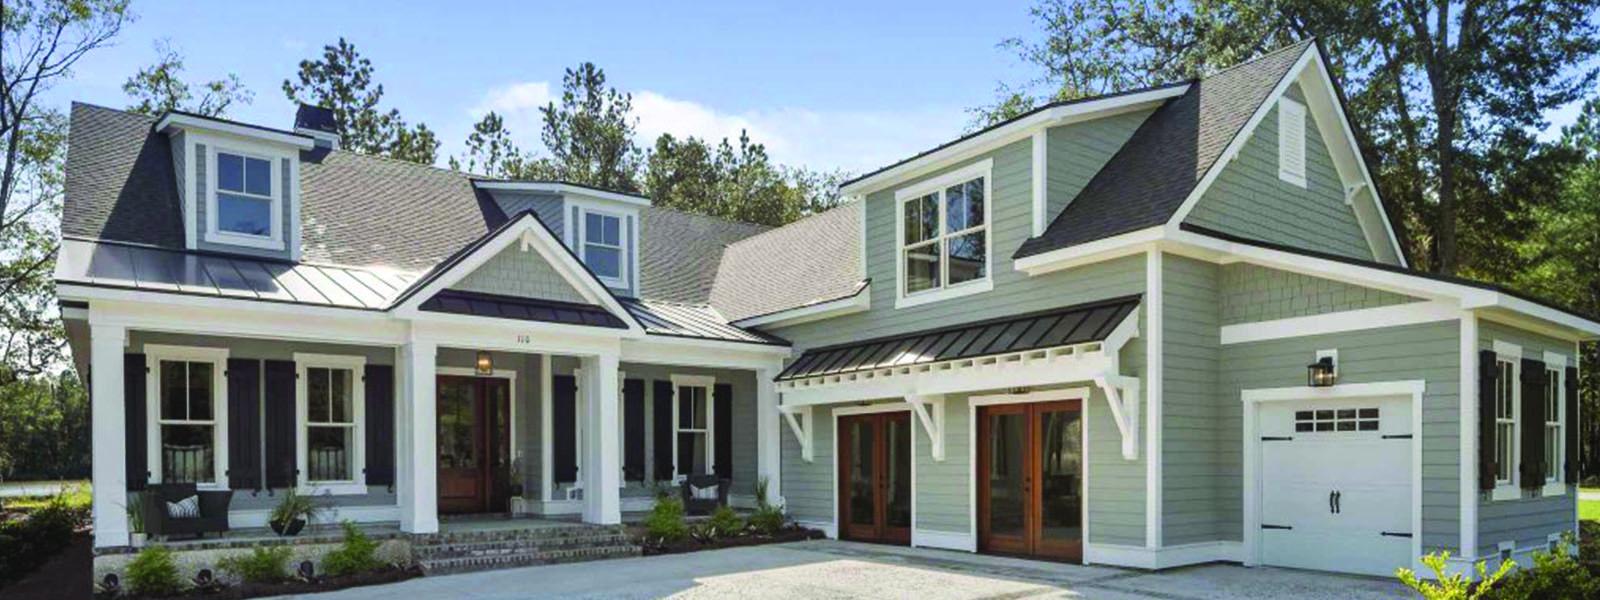 Savannah Quarters | Master Planned Community near Savannah GA | Coastal